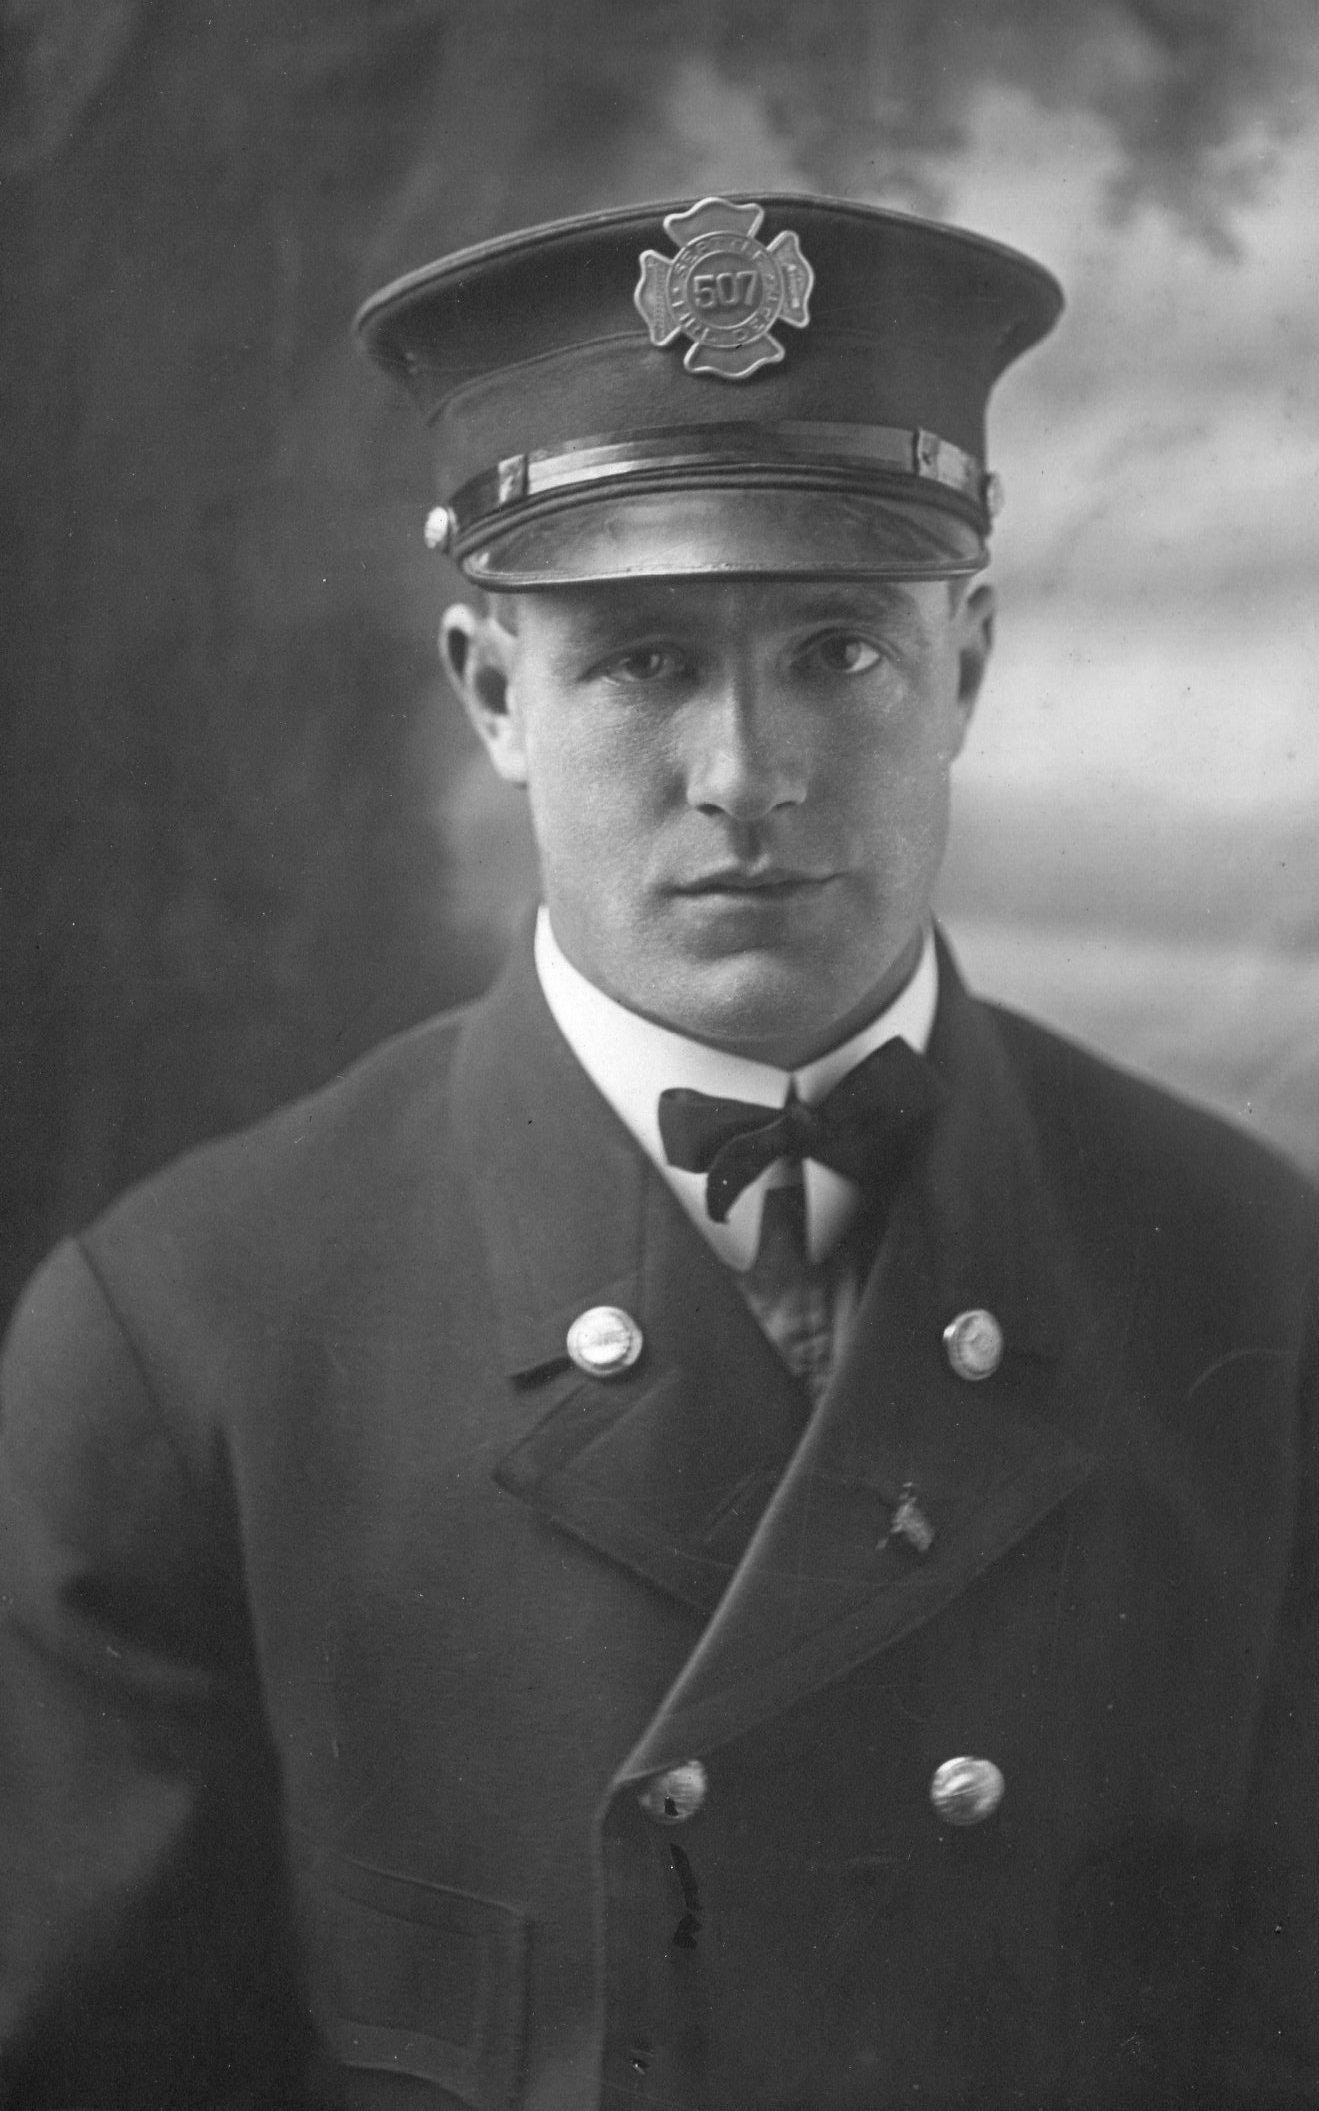 Edgar Parks